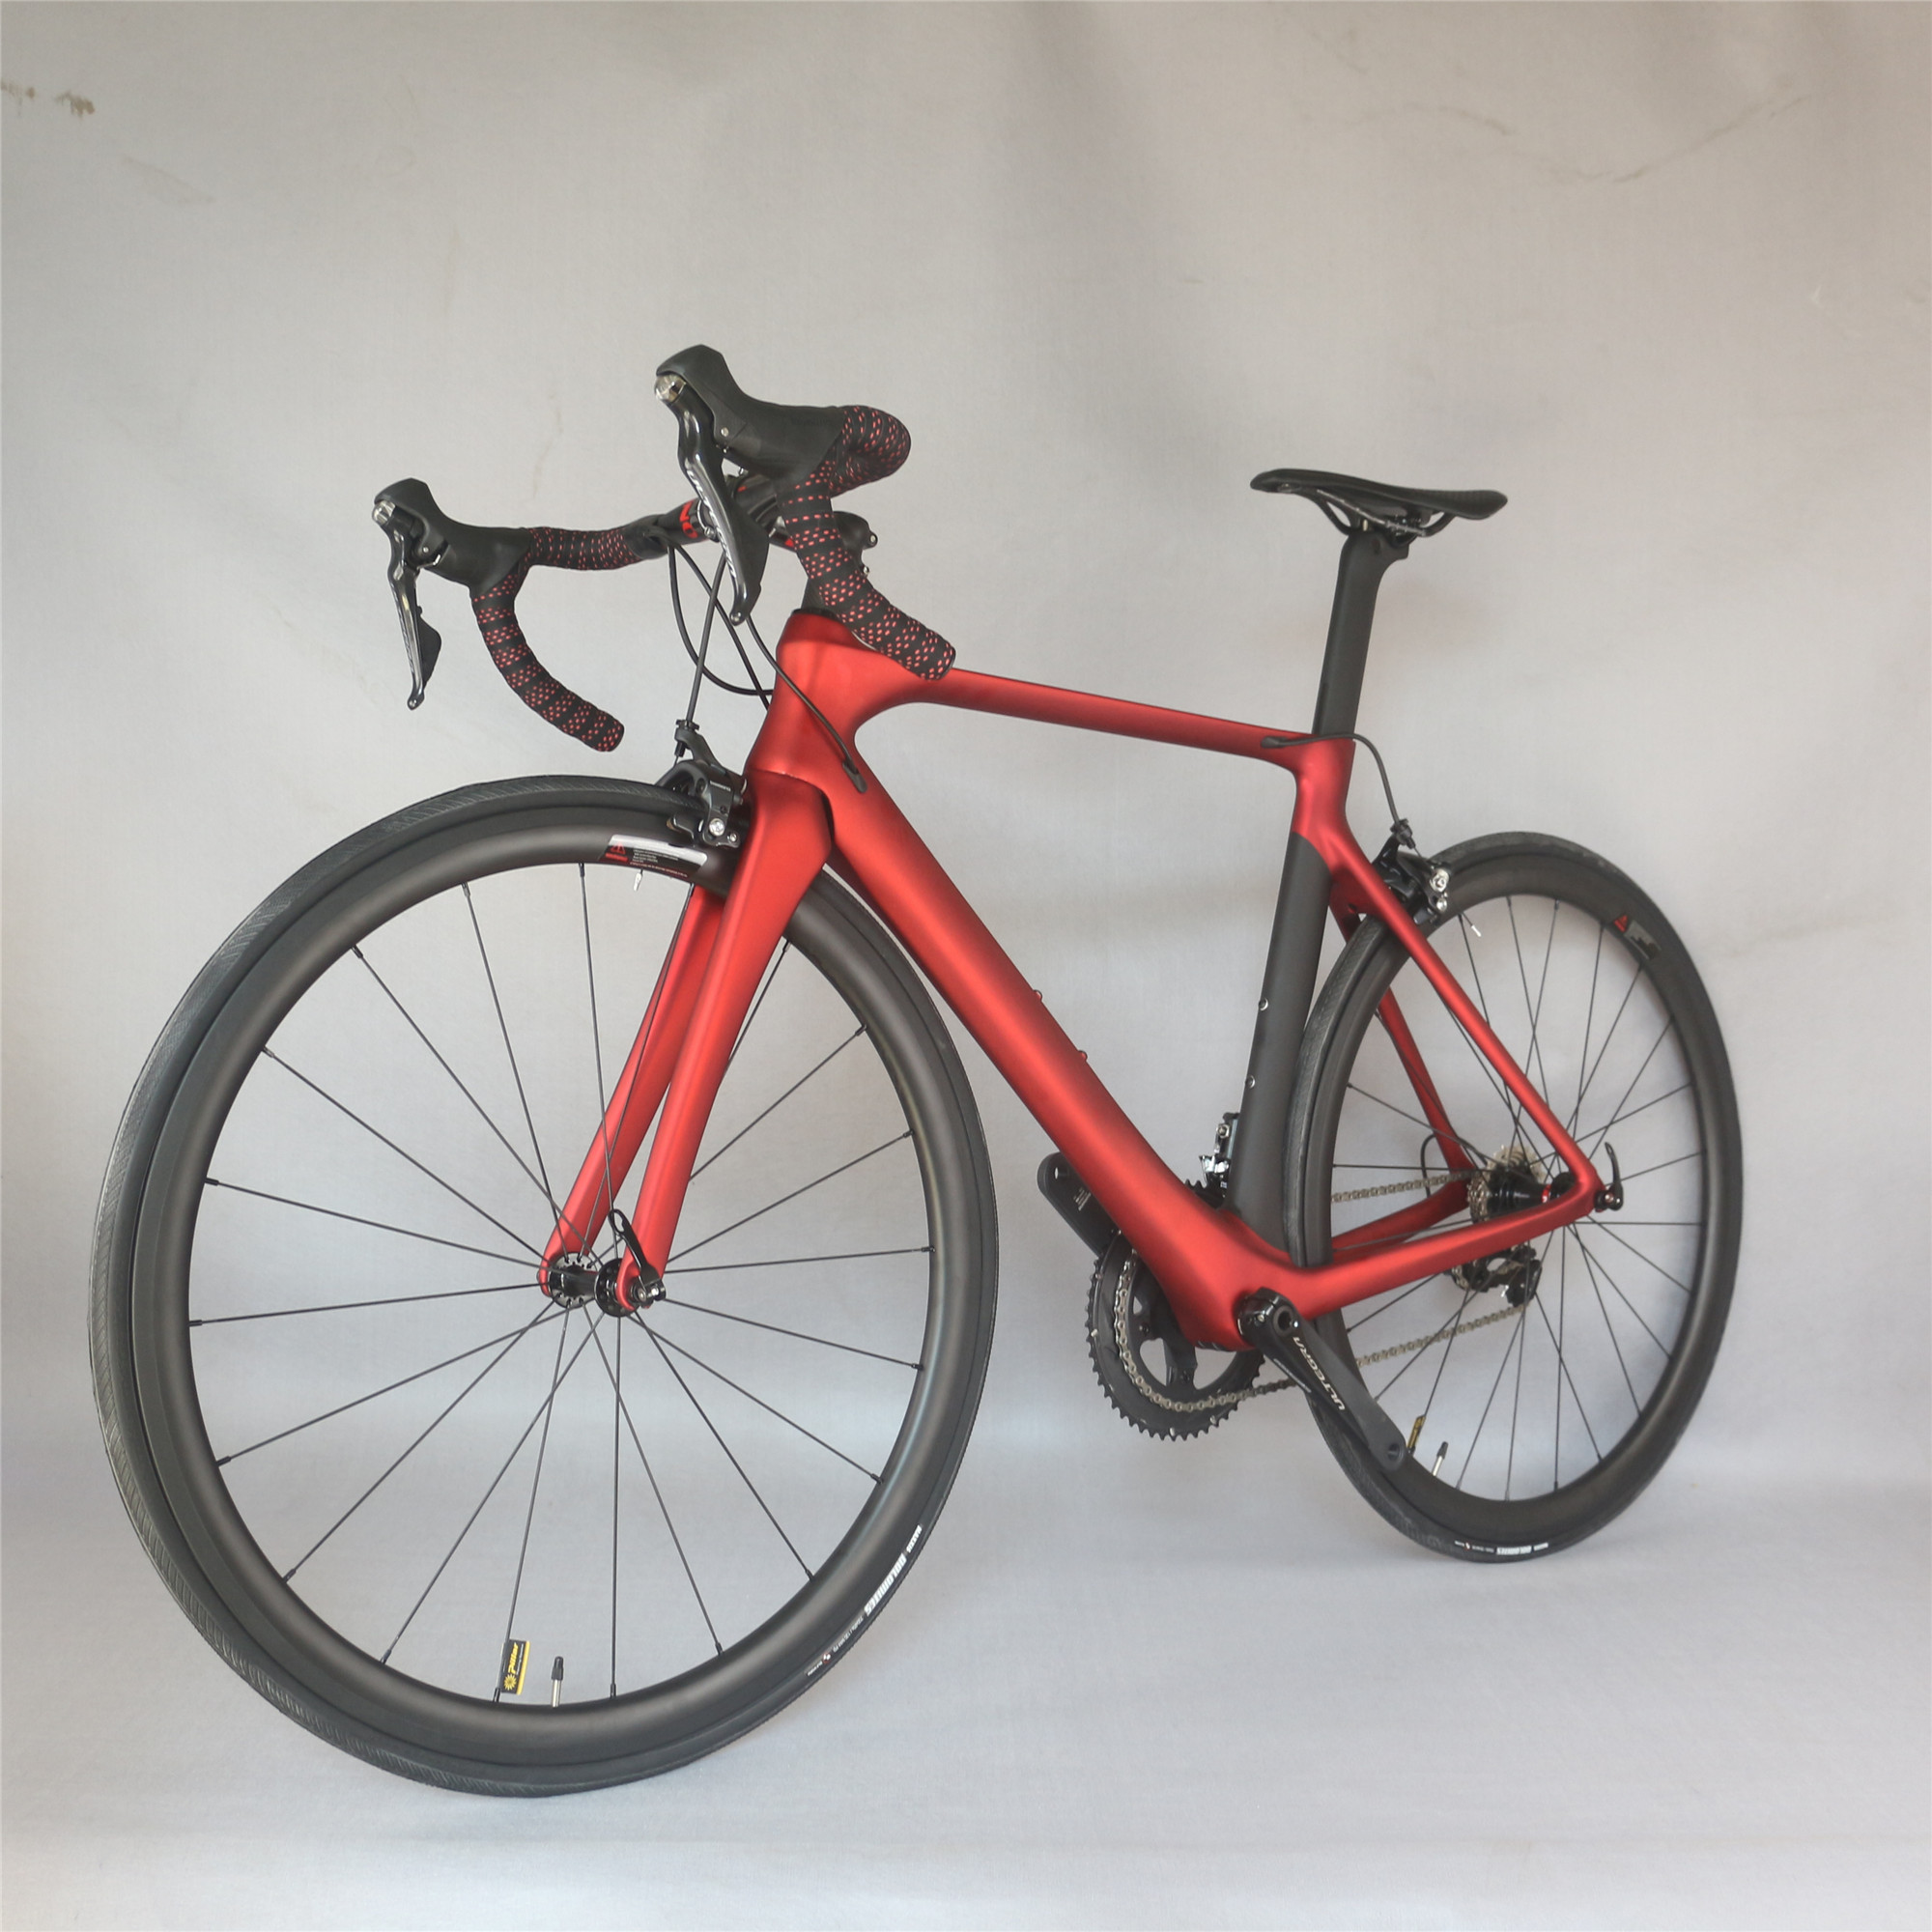 Seraph custom paint 47.5/50.5/53.5cm BSA Aero carbon road complete bike FM268 with SHIMAN00 R8000 groupset